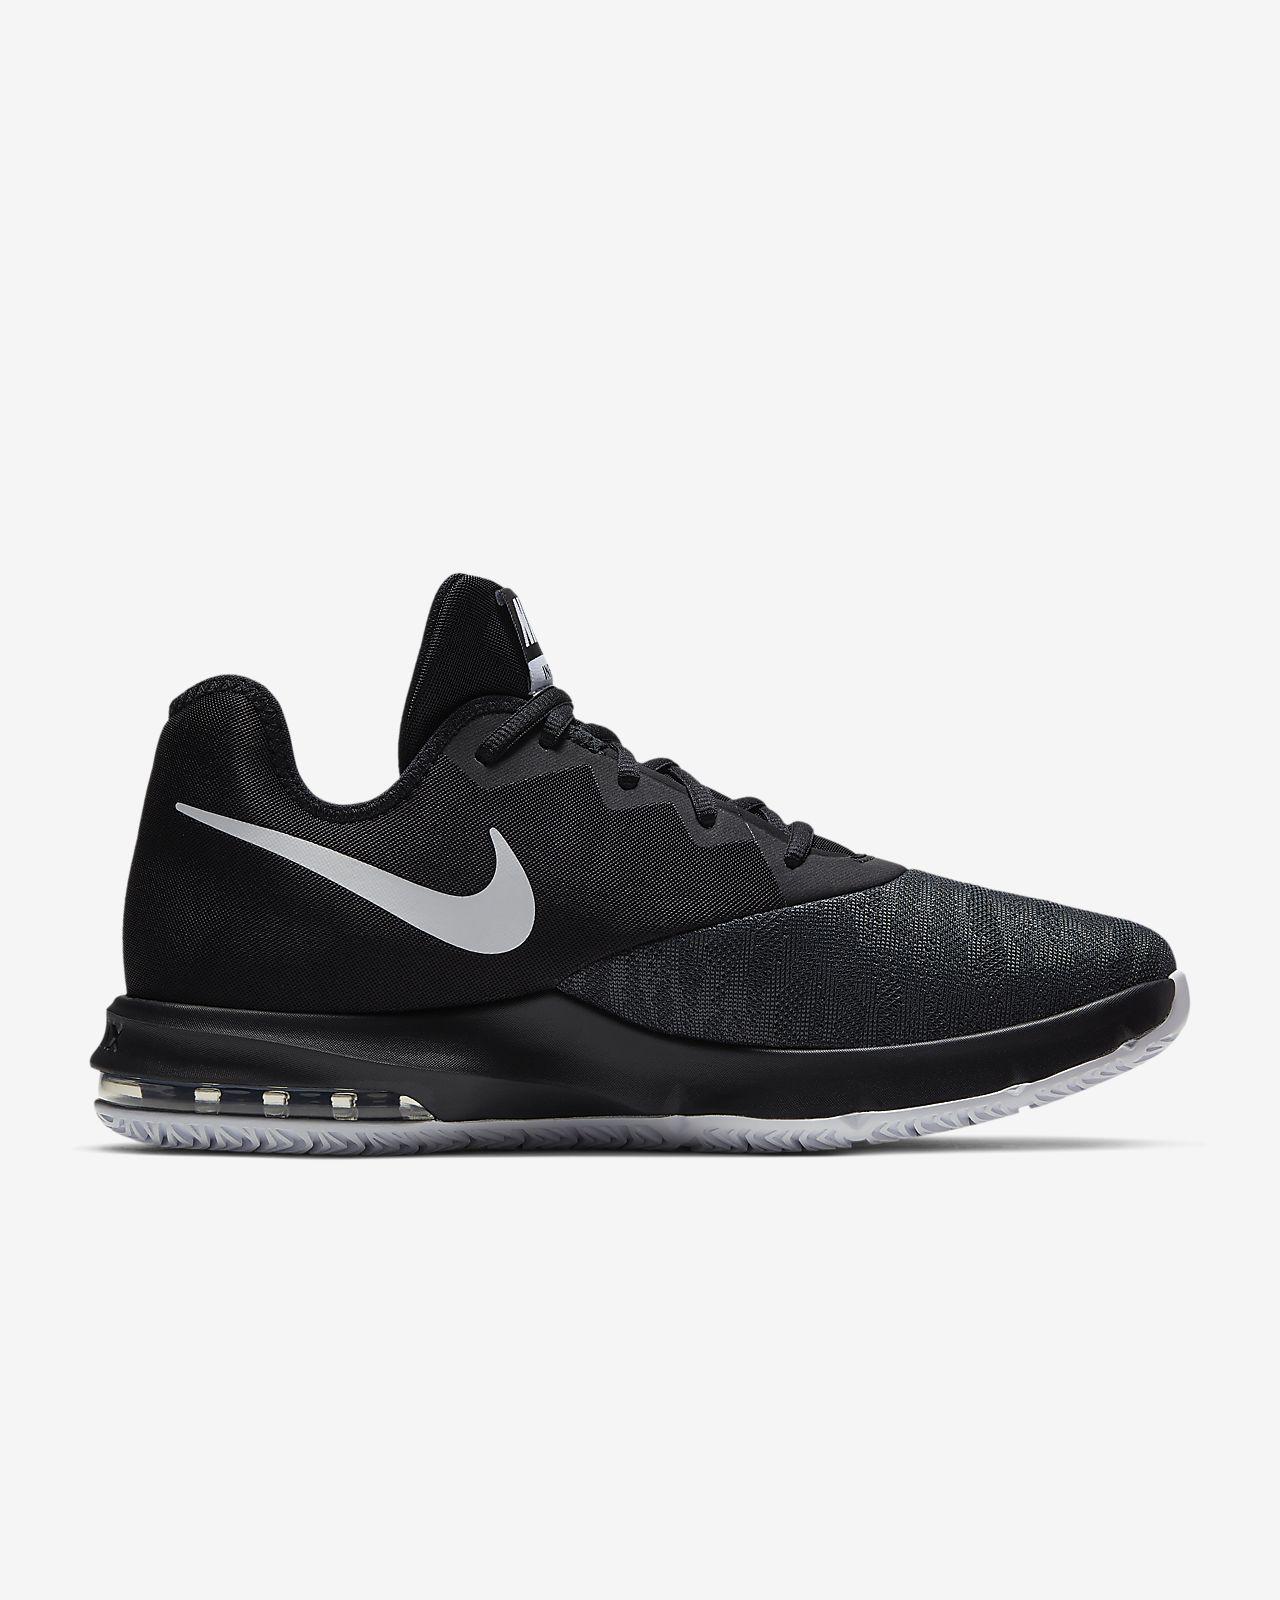 f6298ff8b46 Nike Air Max Infuriate III Low Men s Basketball Shoe. Nike.com